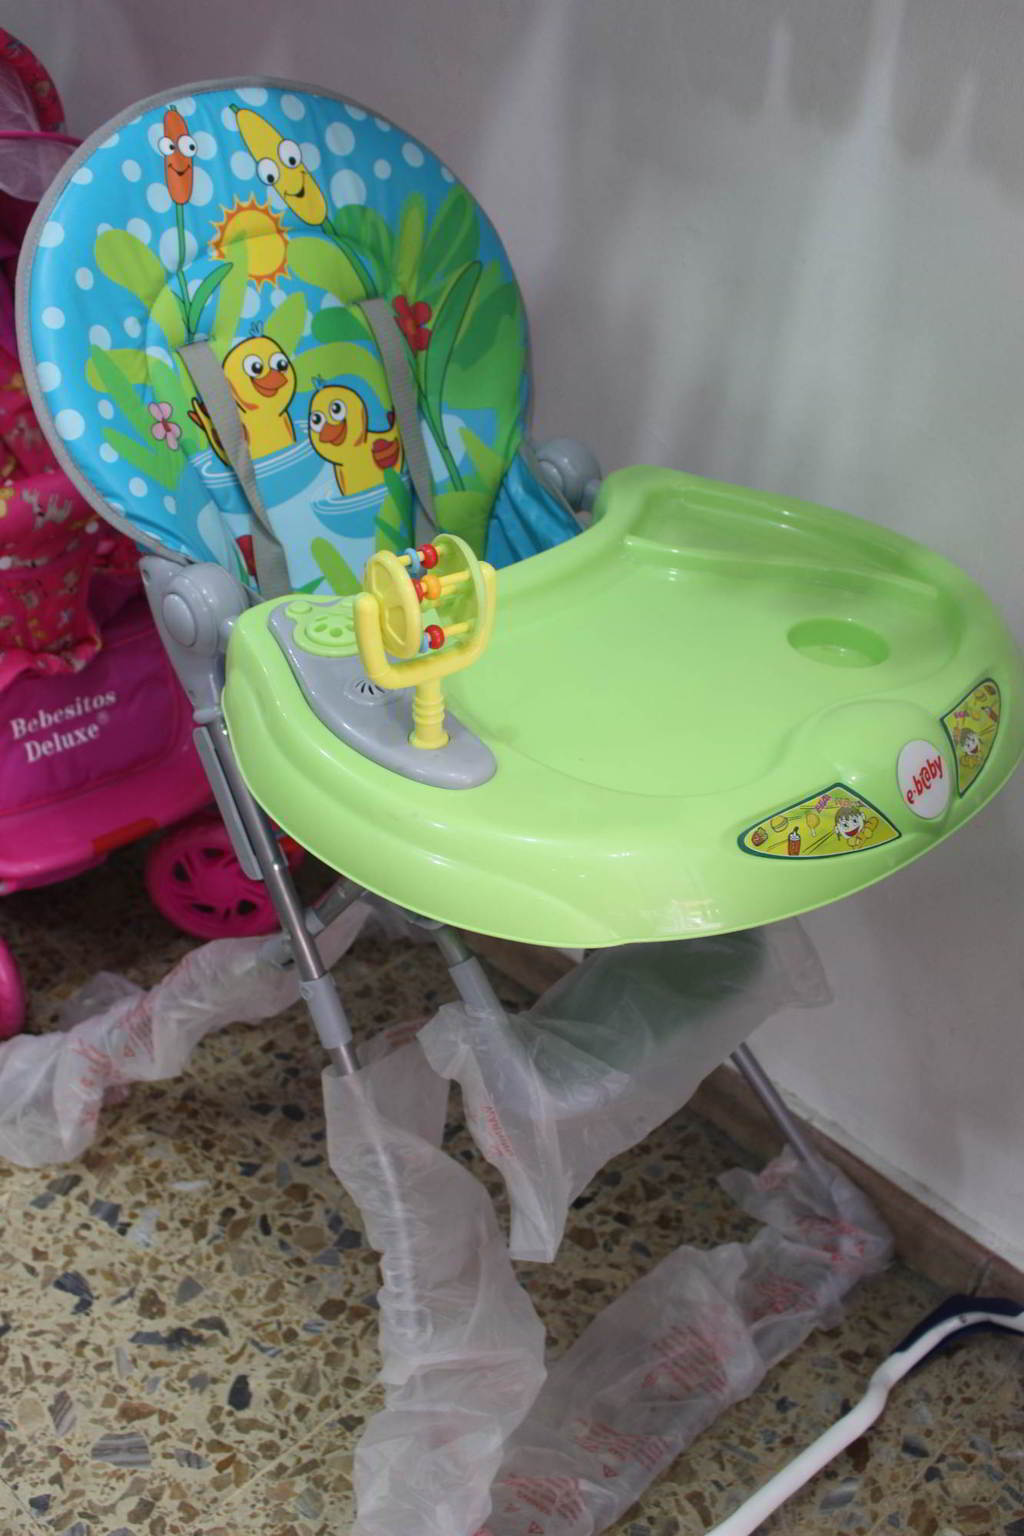 Silla comedor tienda todo para bebe for Sillas para comer ninos 3 anos